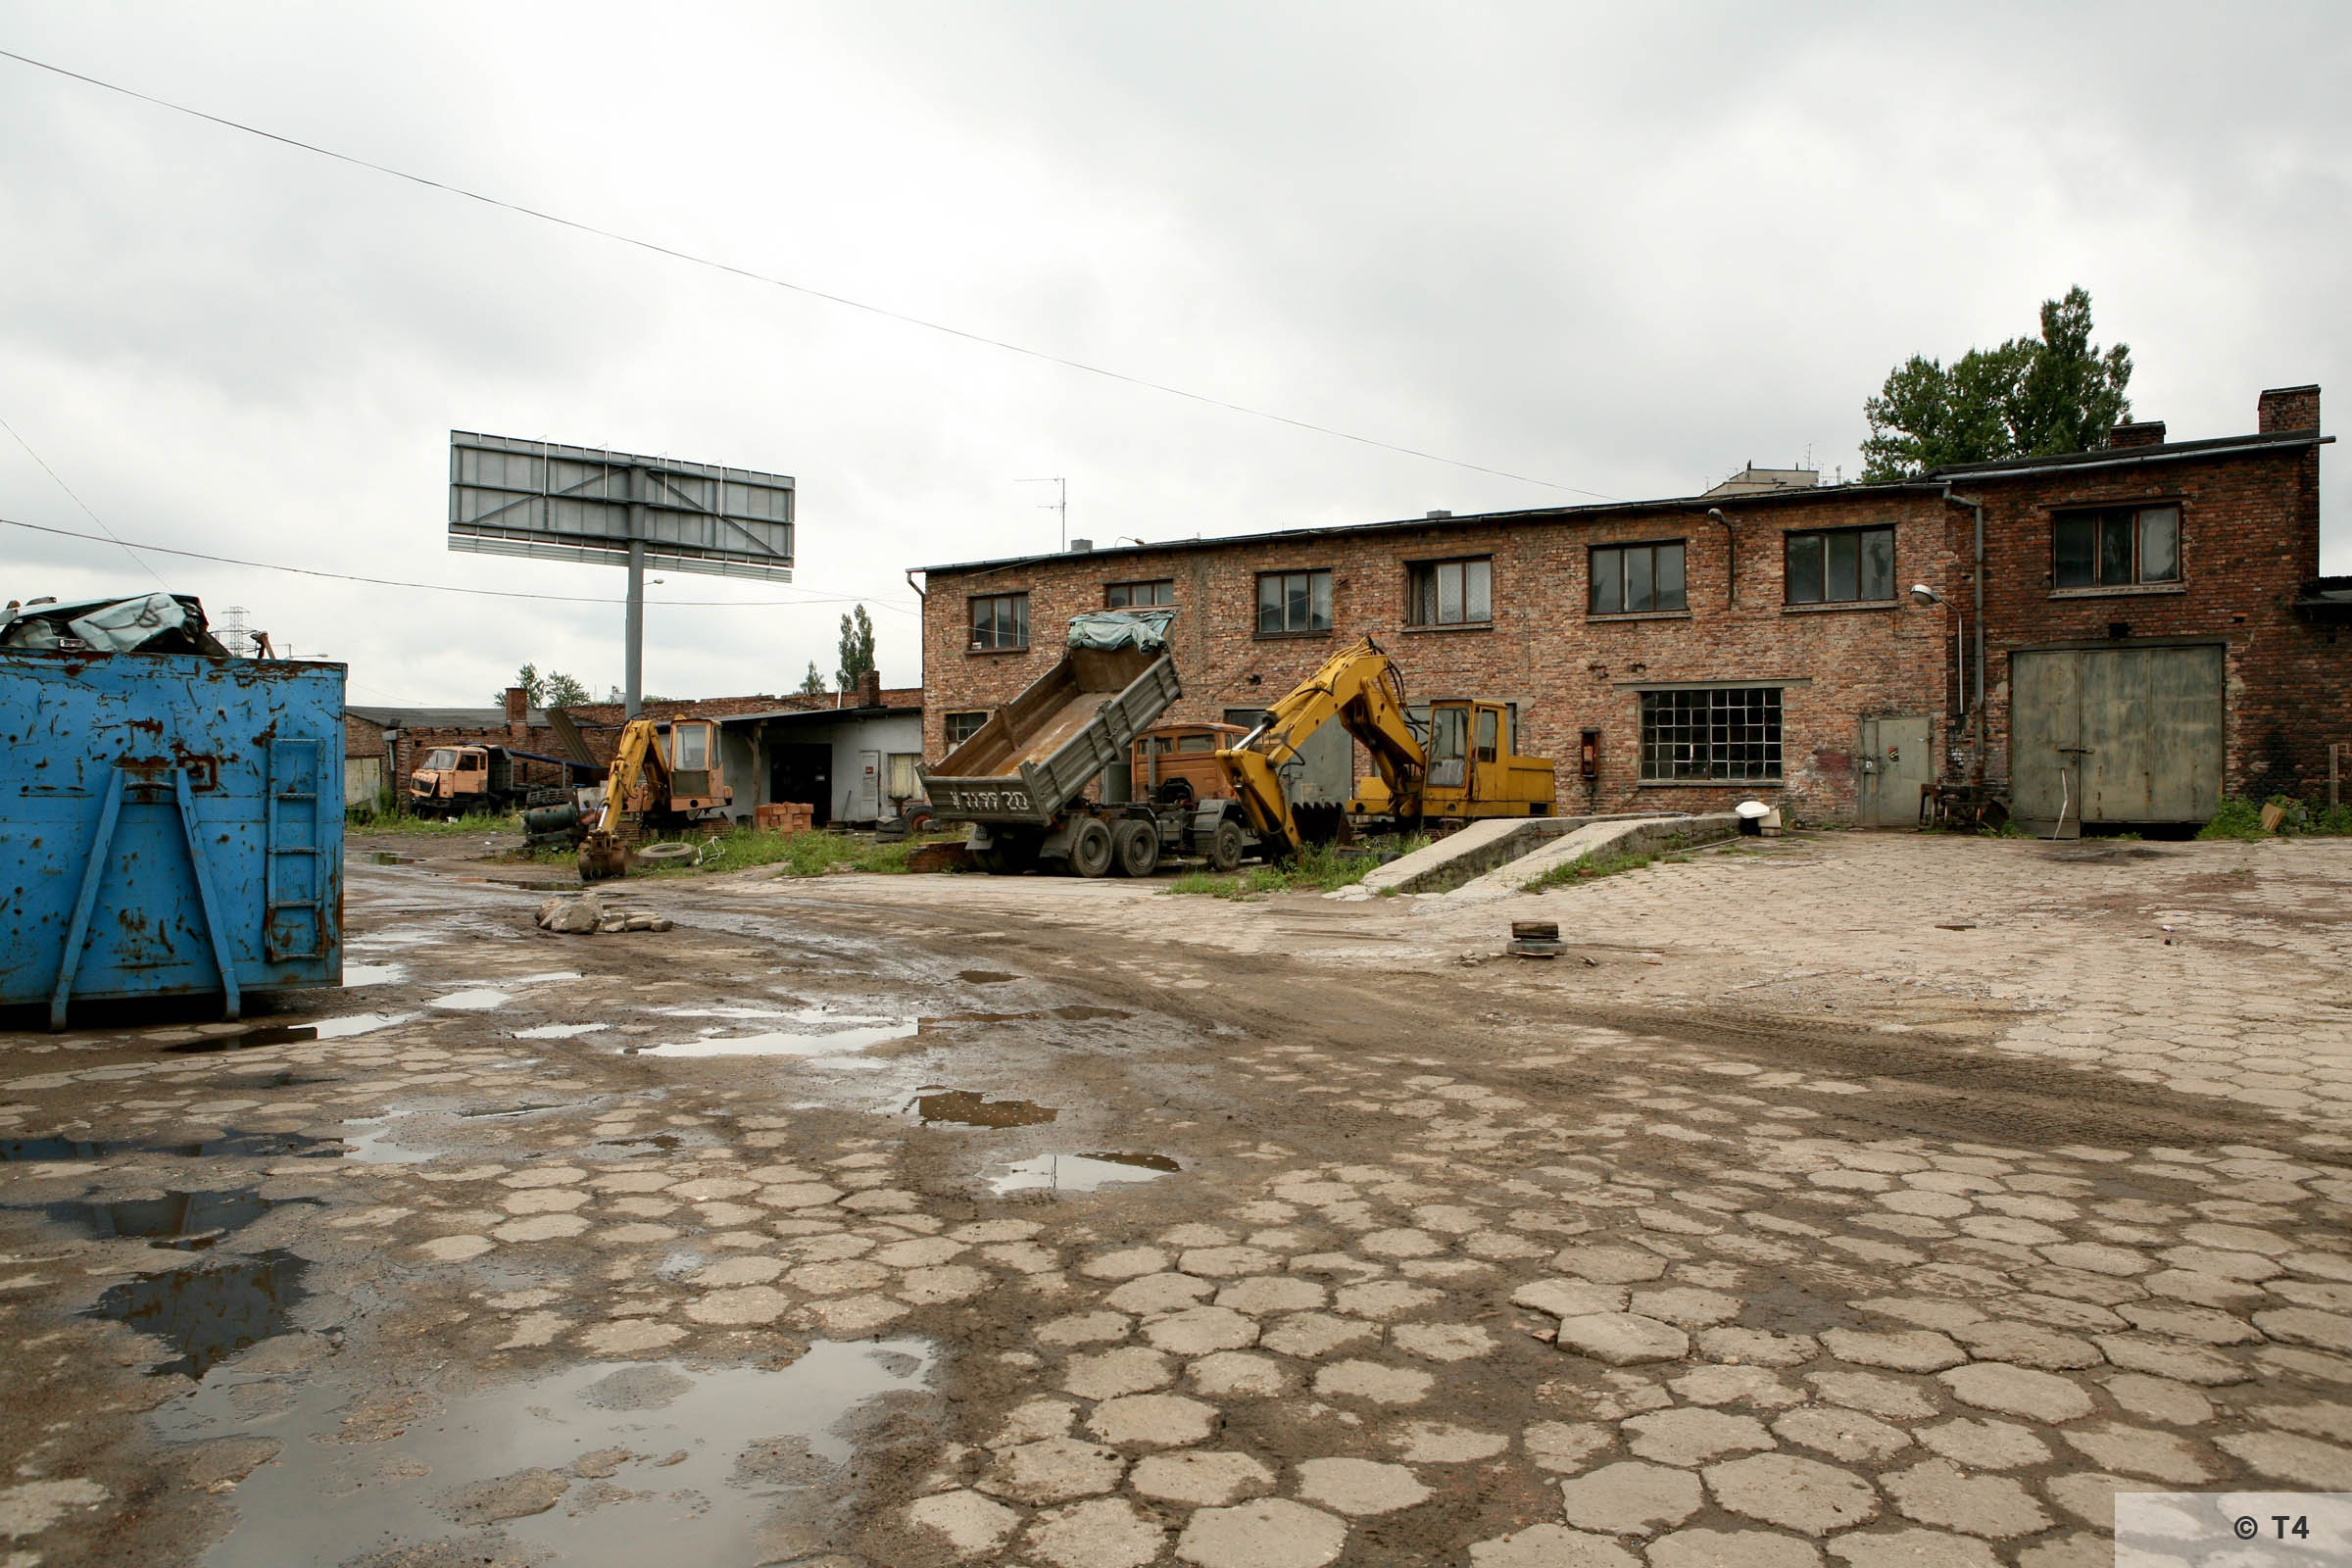 Brickyard at ul Ceglana in Katowice where the prisoners lived. 2007 T4 9474